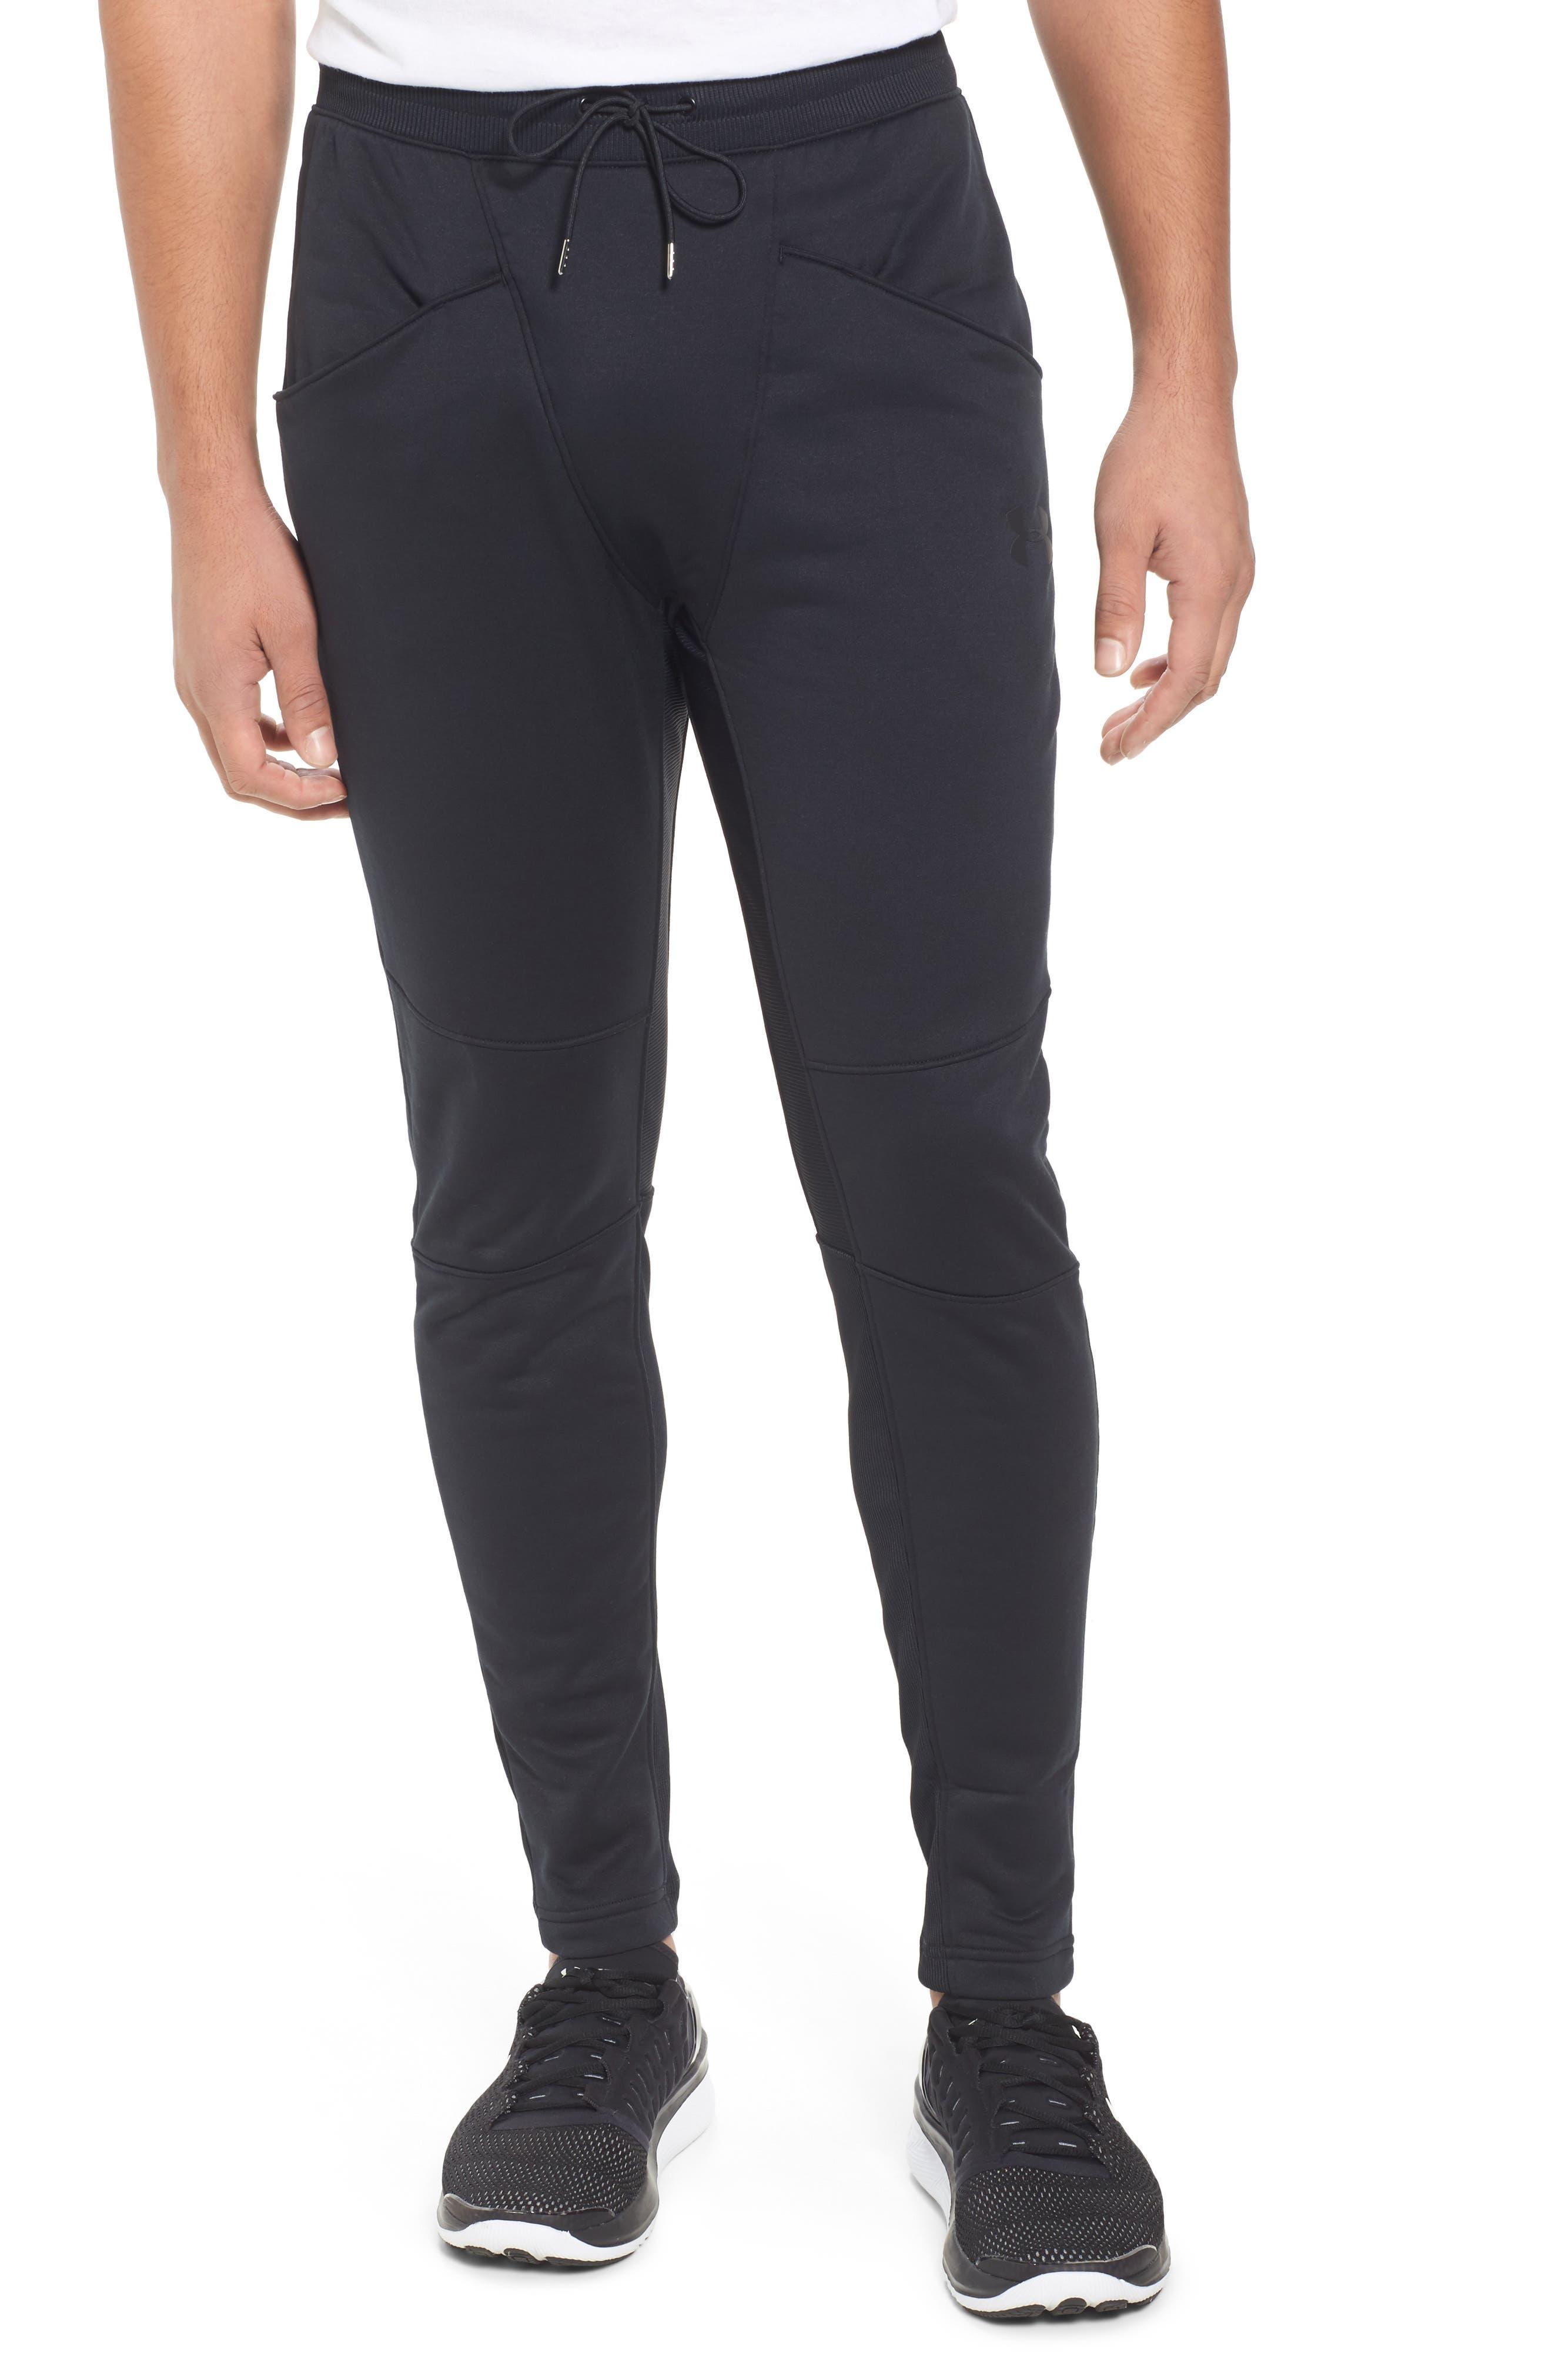 Courtside Training Pants,                         Main,                         color, 001